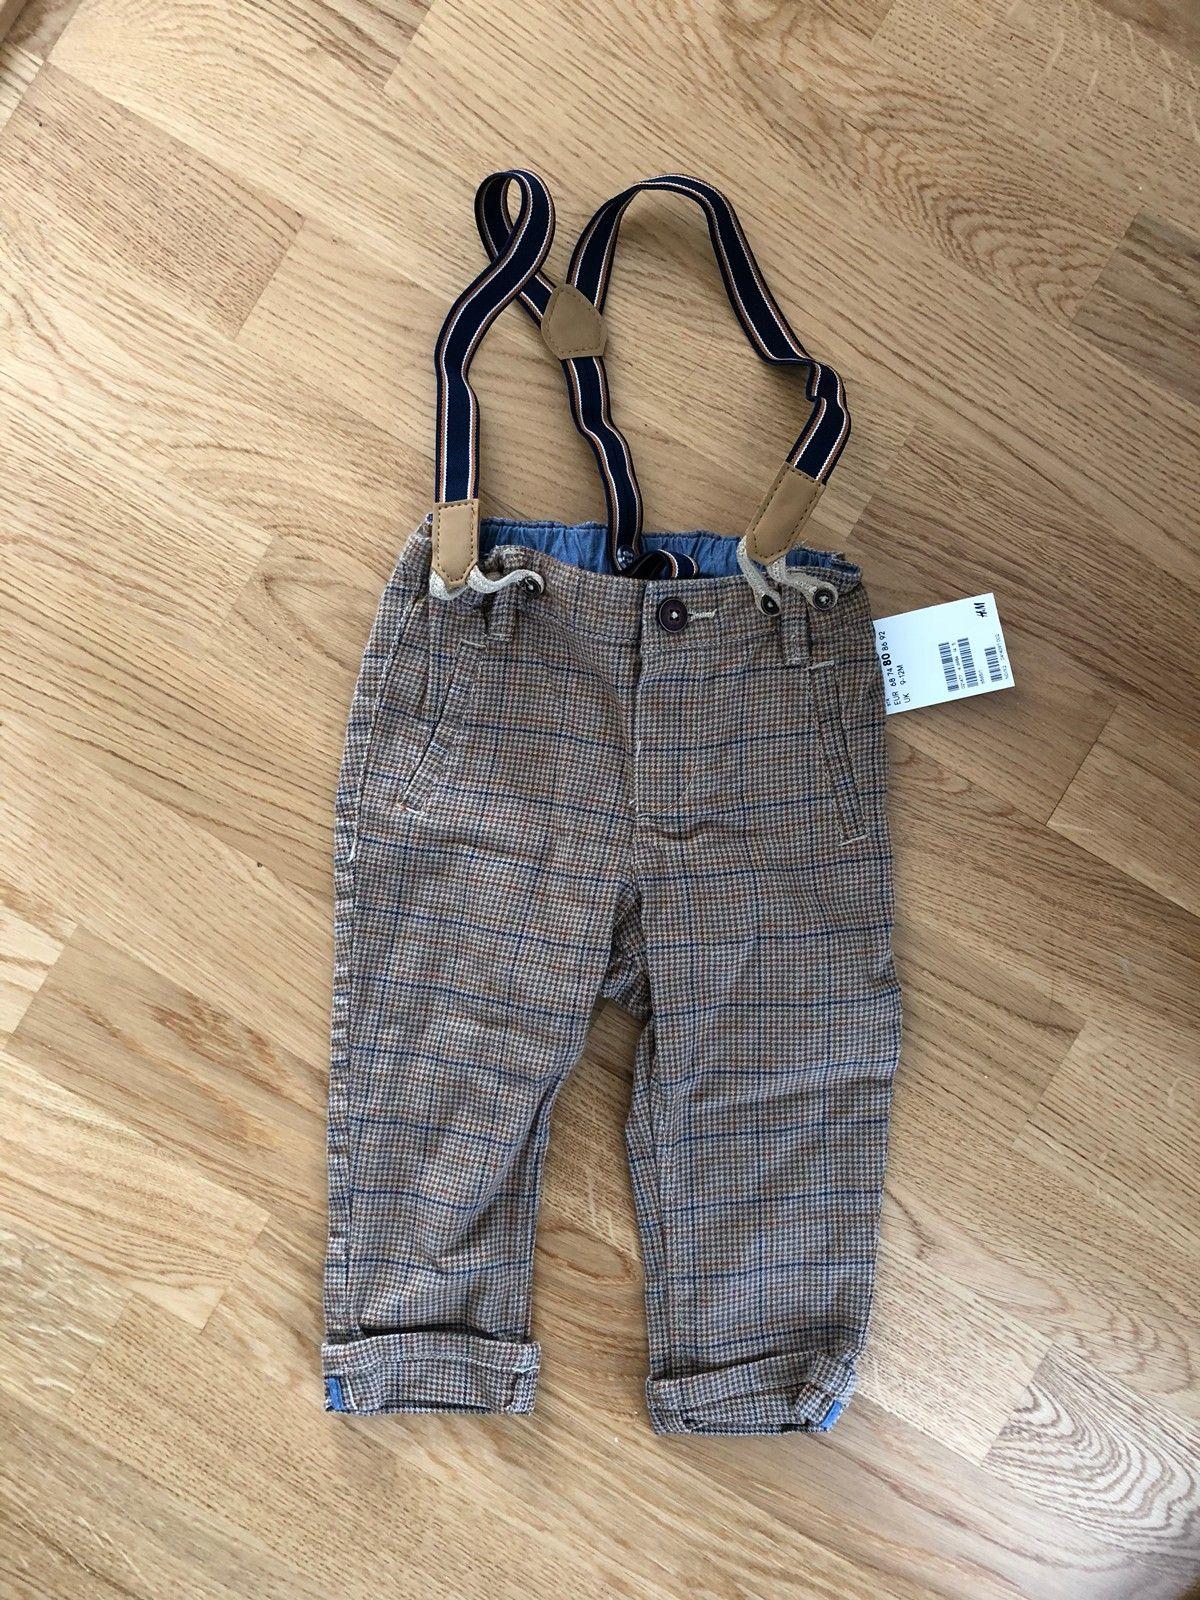 288ade5d12c4 Tøff bukse med seler ubrukt str 80